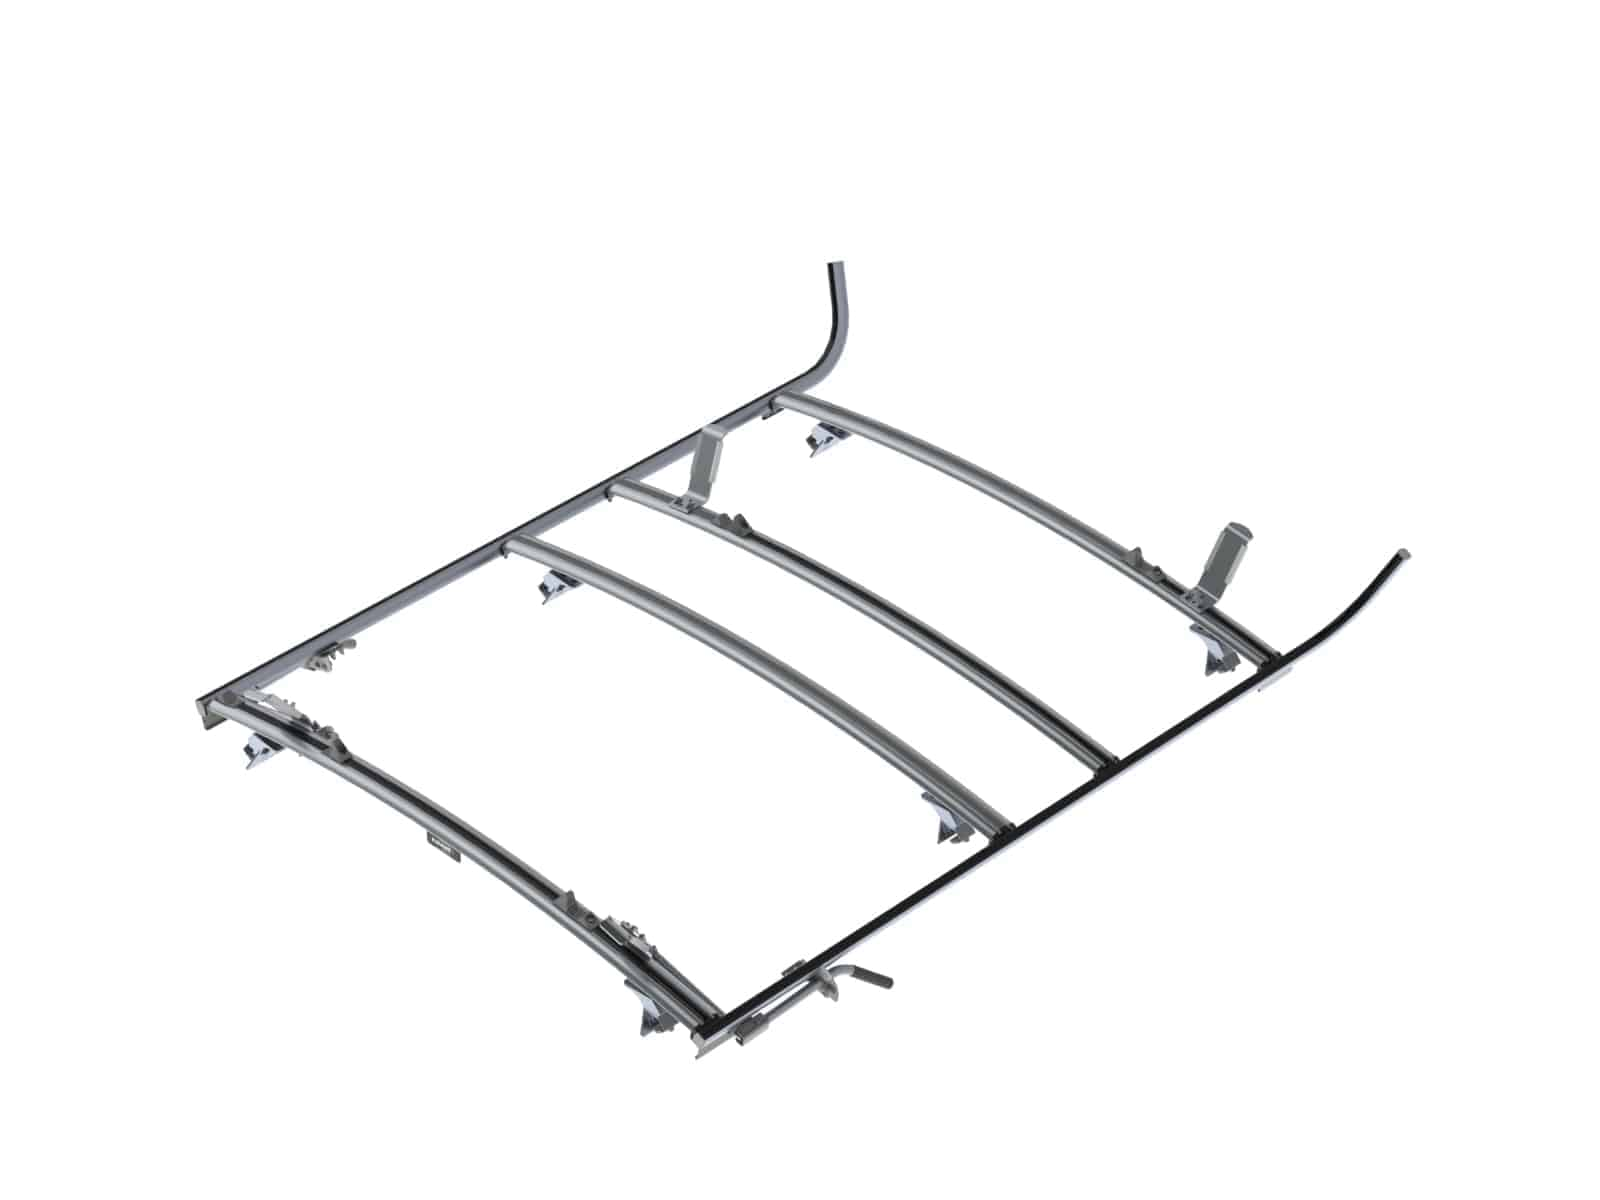 Combination Ranger Ladder Rack 3 Bar System Gm Savana